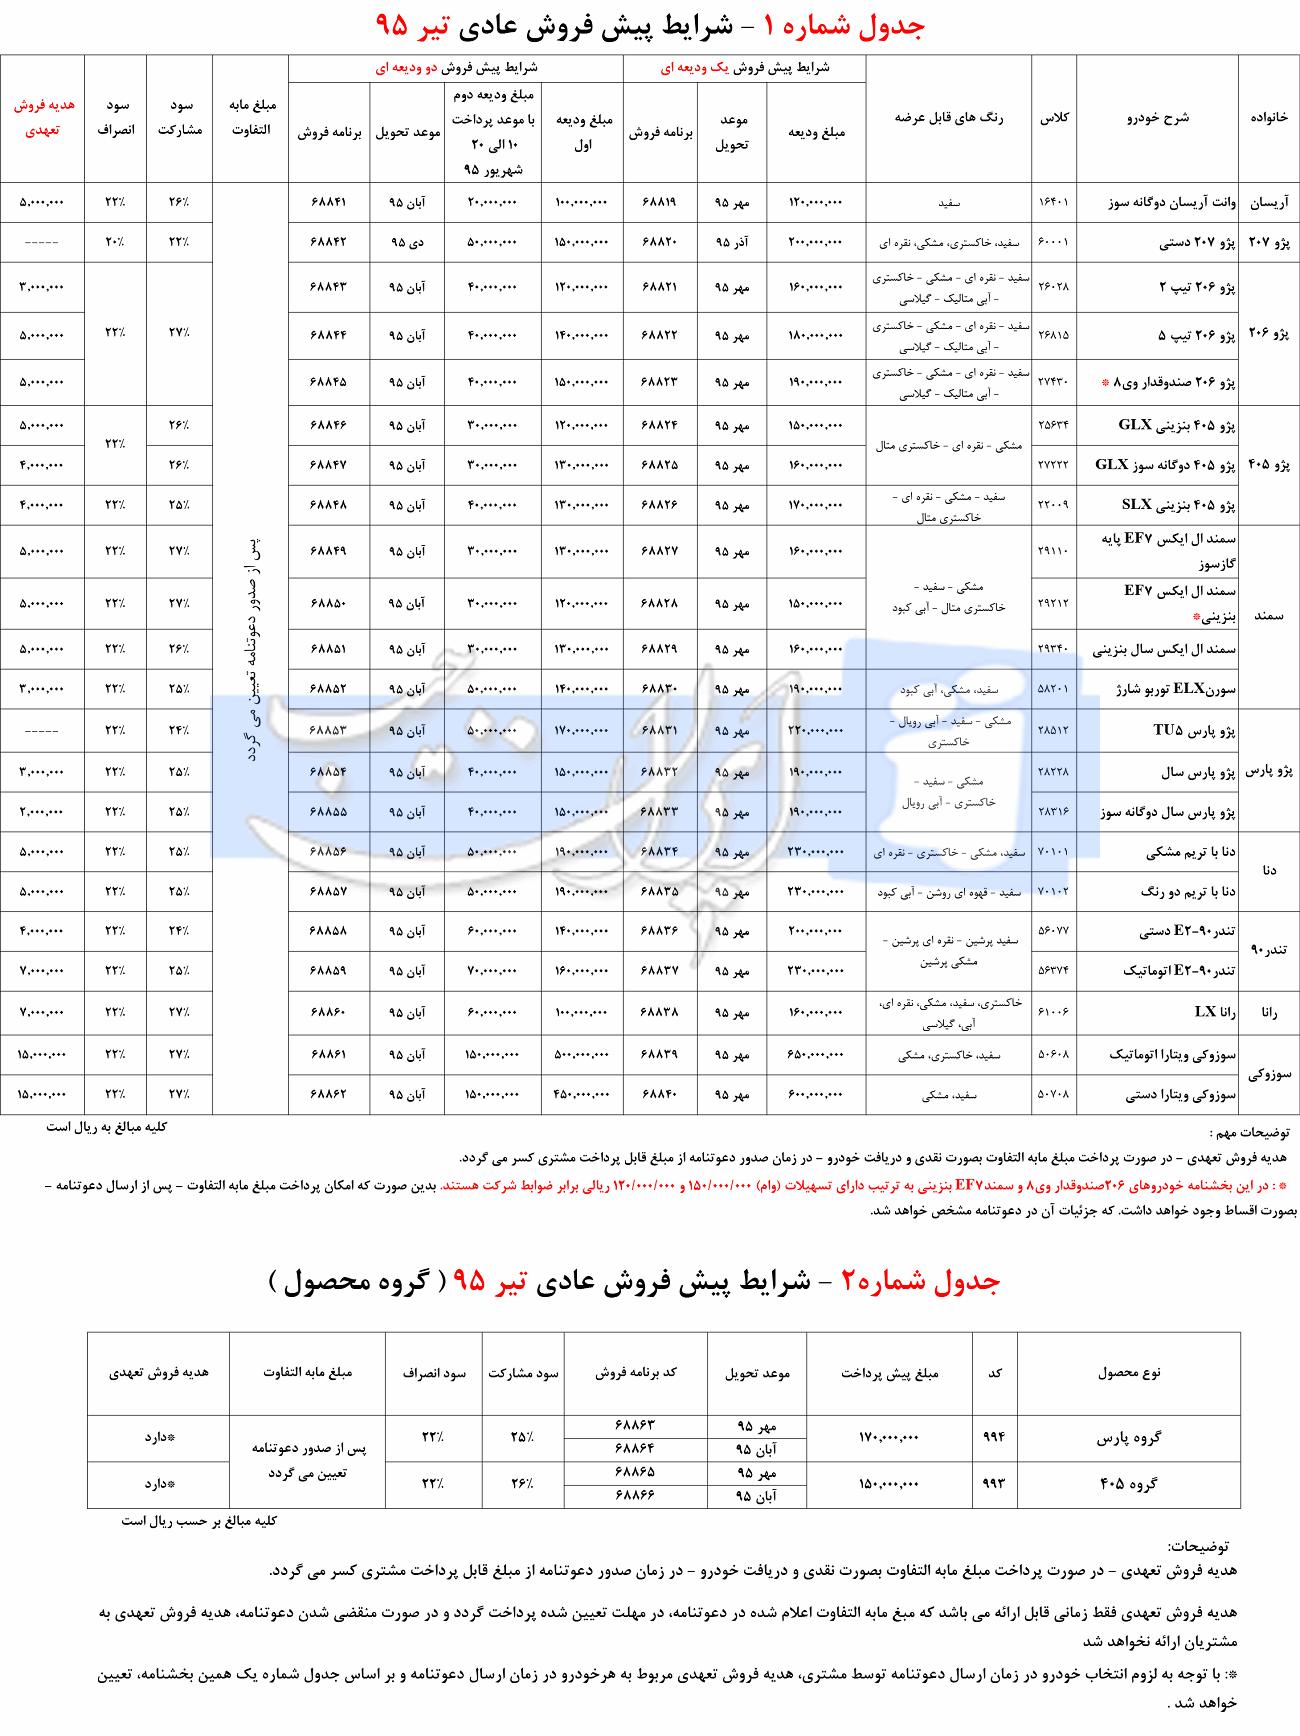 پیشفروش کلیه محصولات ایران خودرو